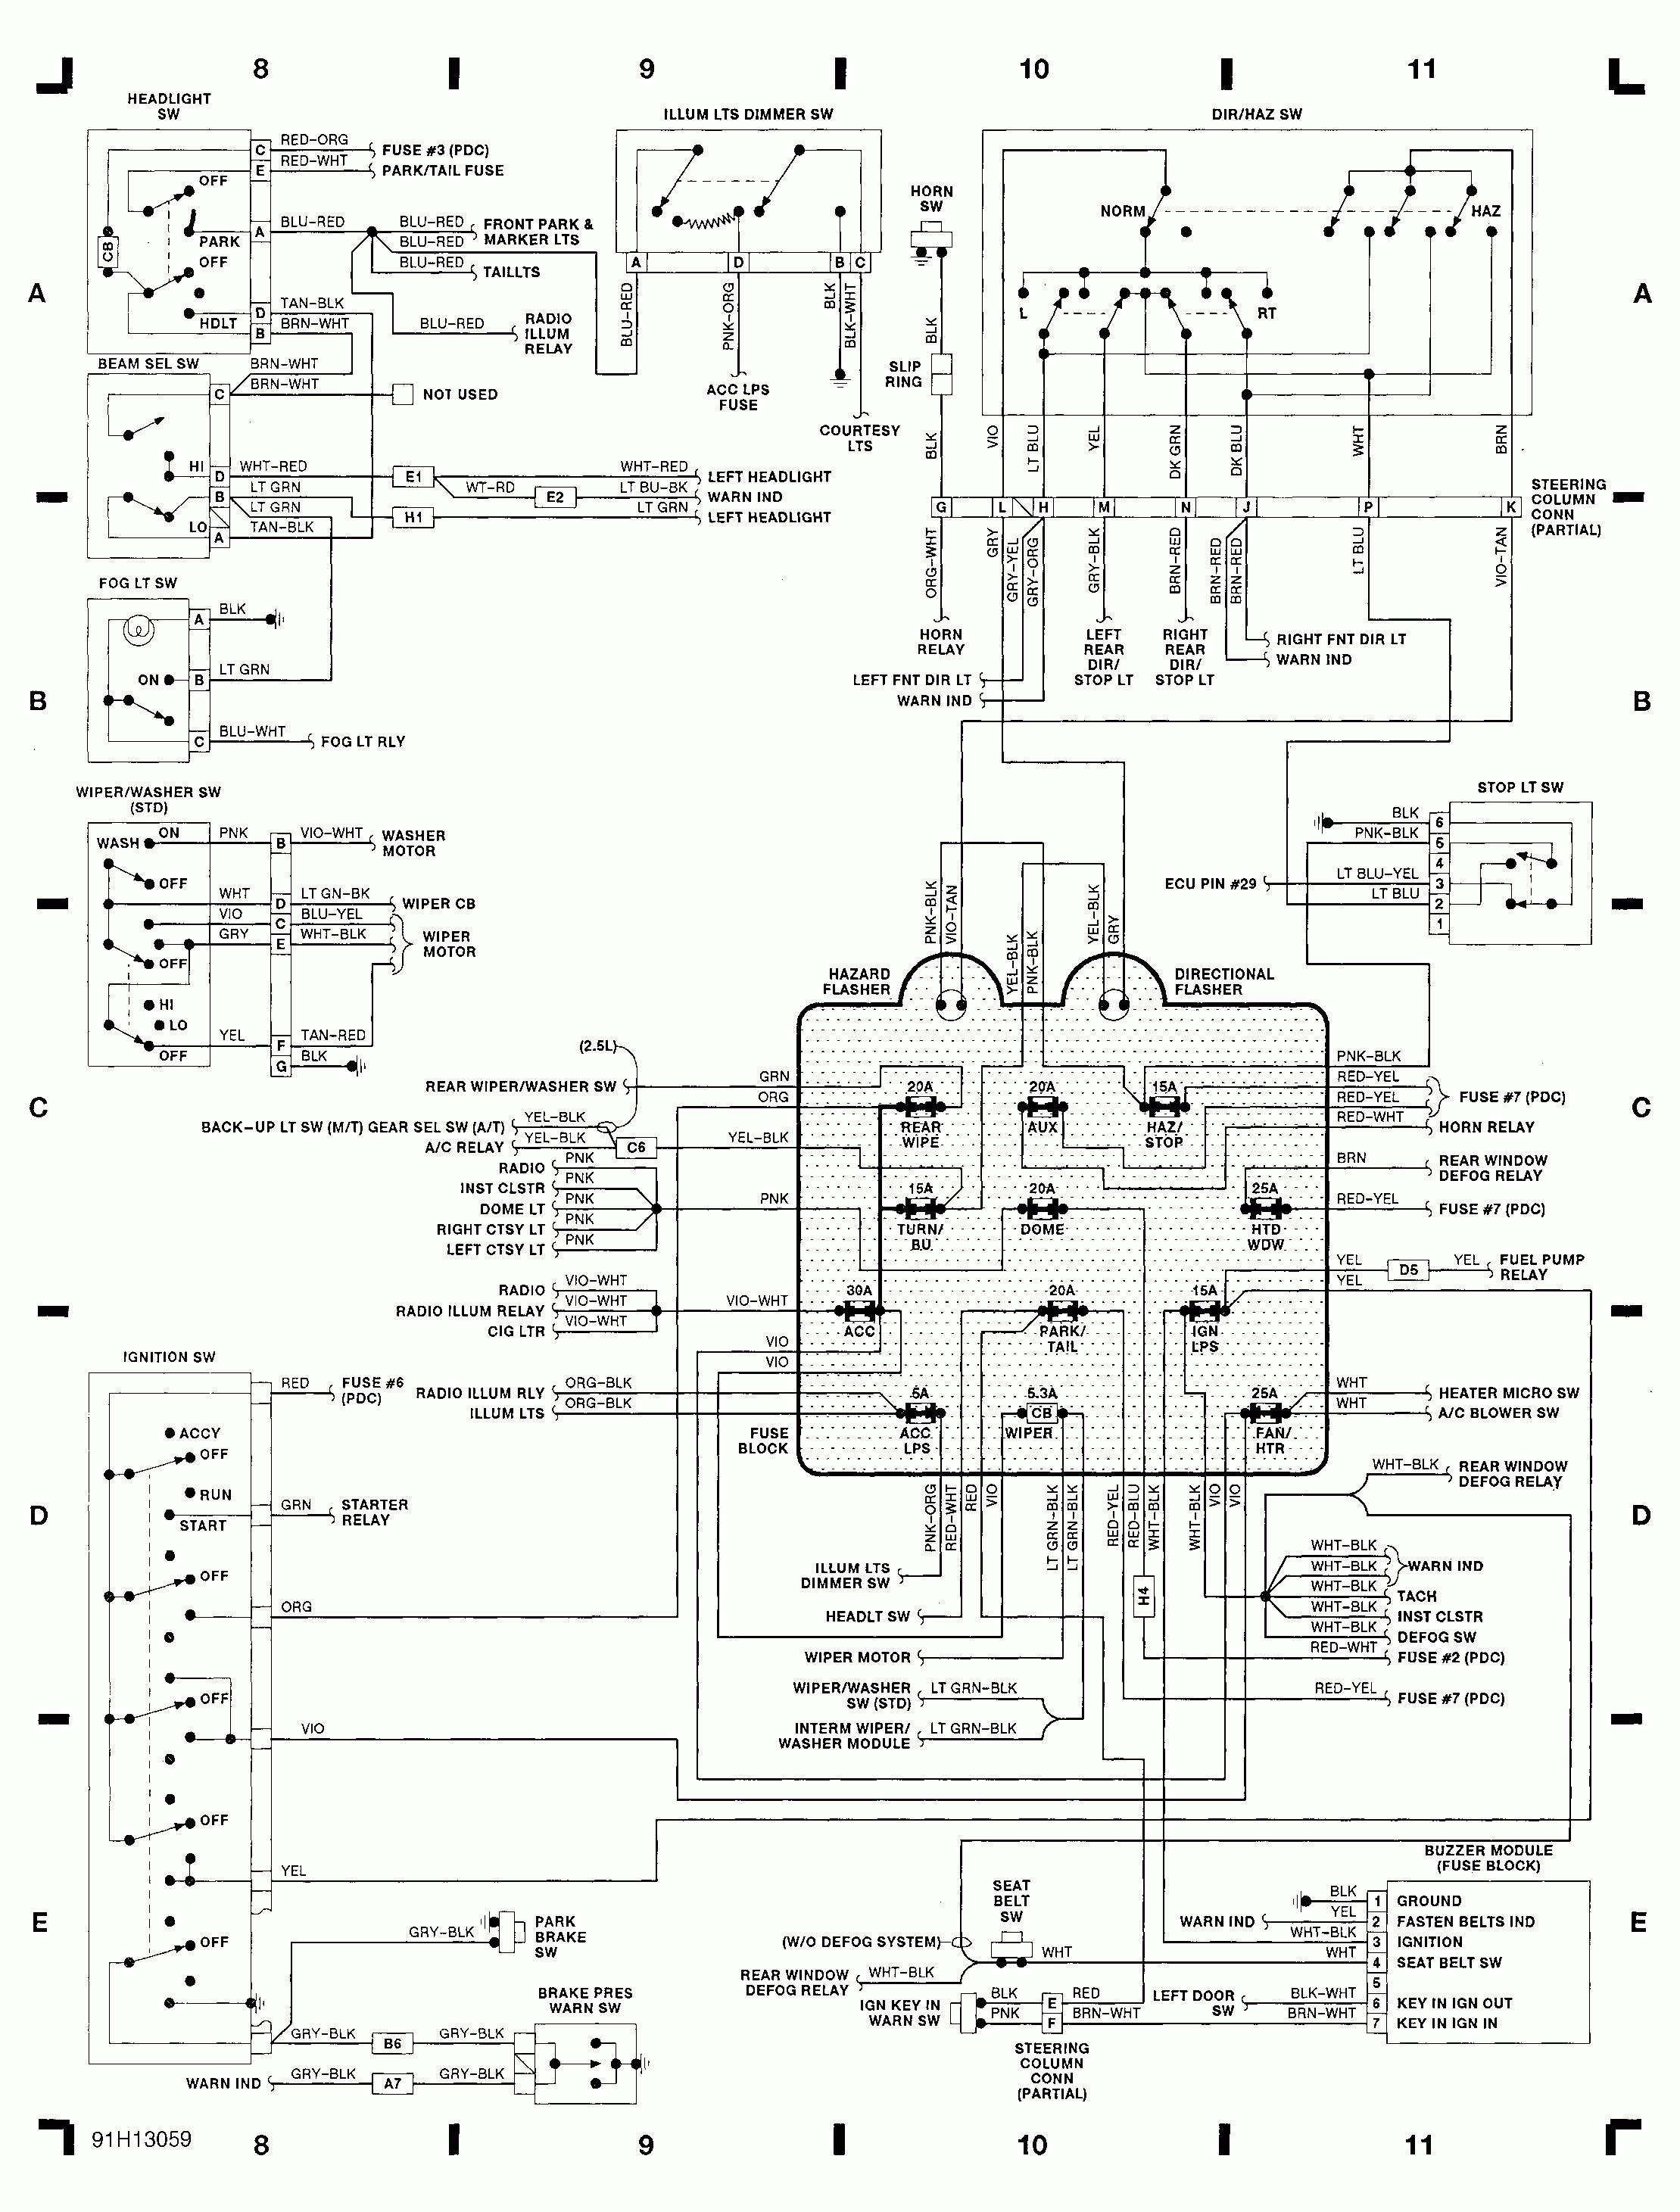 Jeep Wrangler Factory Radio Wiring